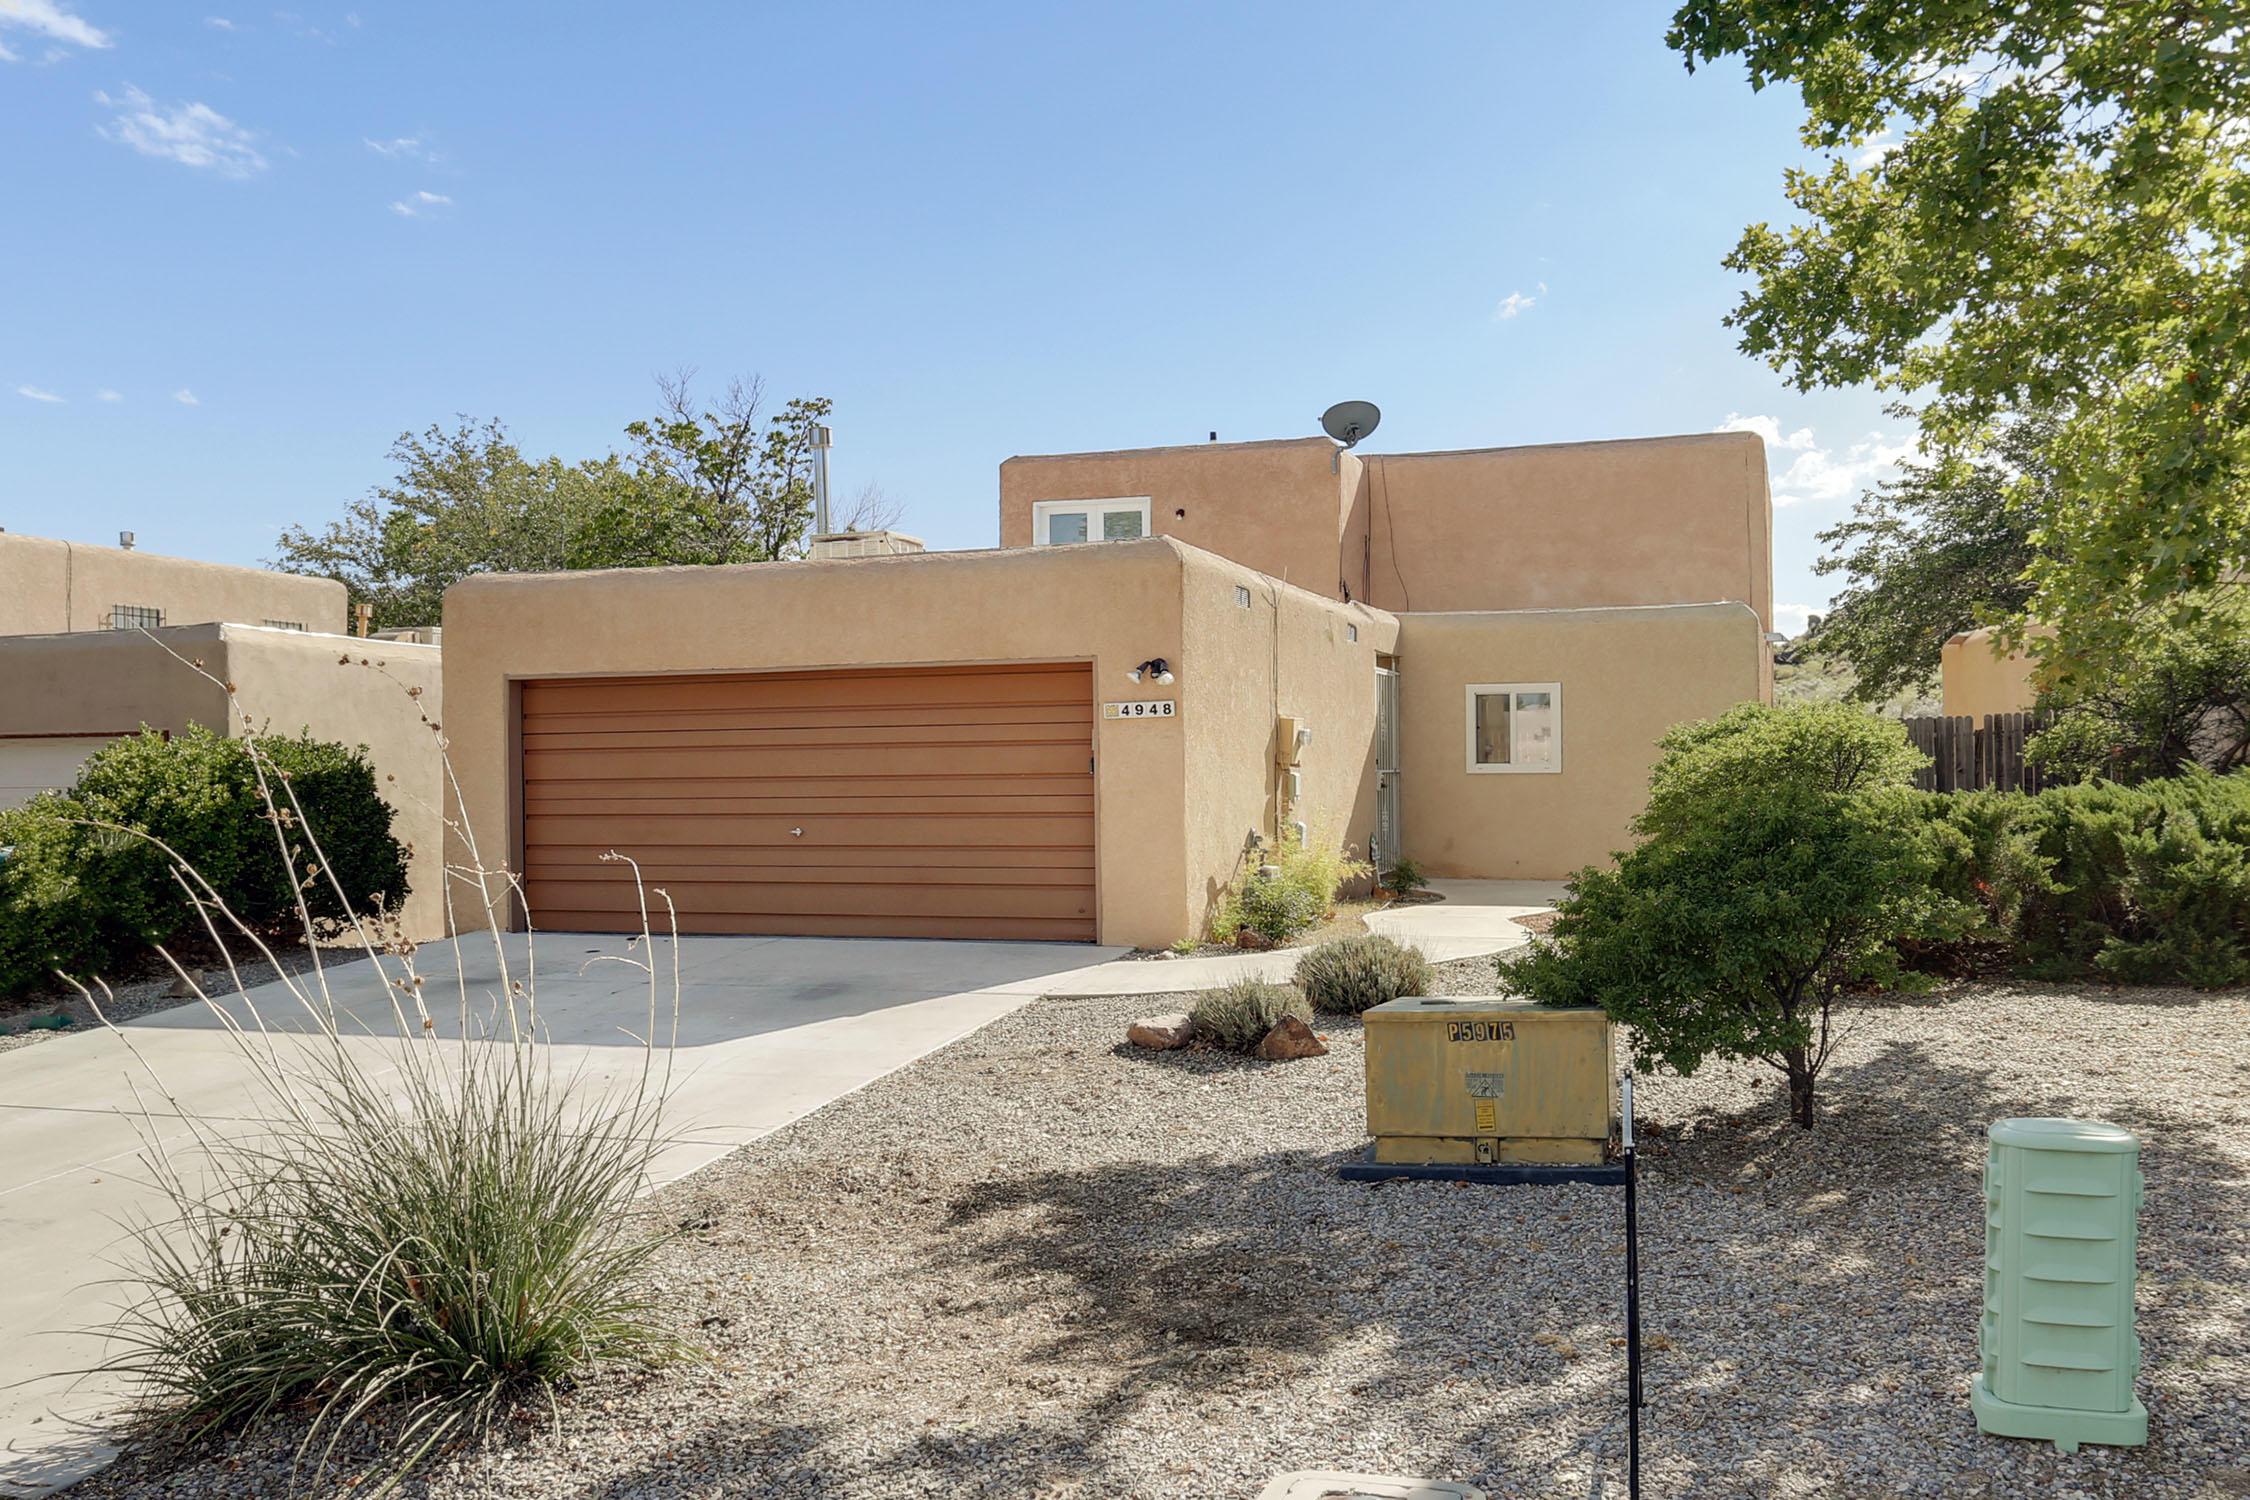 4948 NW Quail Ridge Drive, Northwest Albuquerque and Northwest Heights, New Mexico